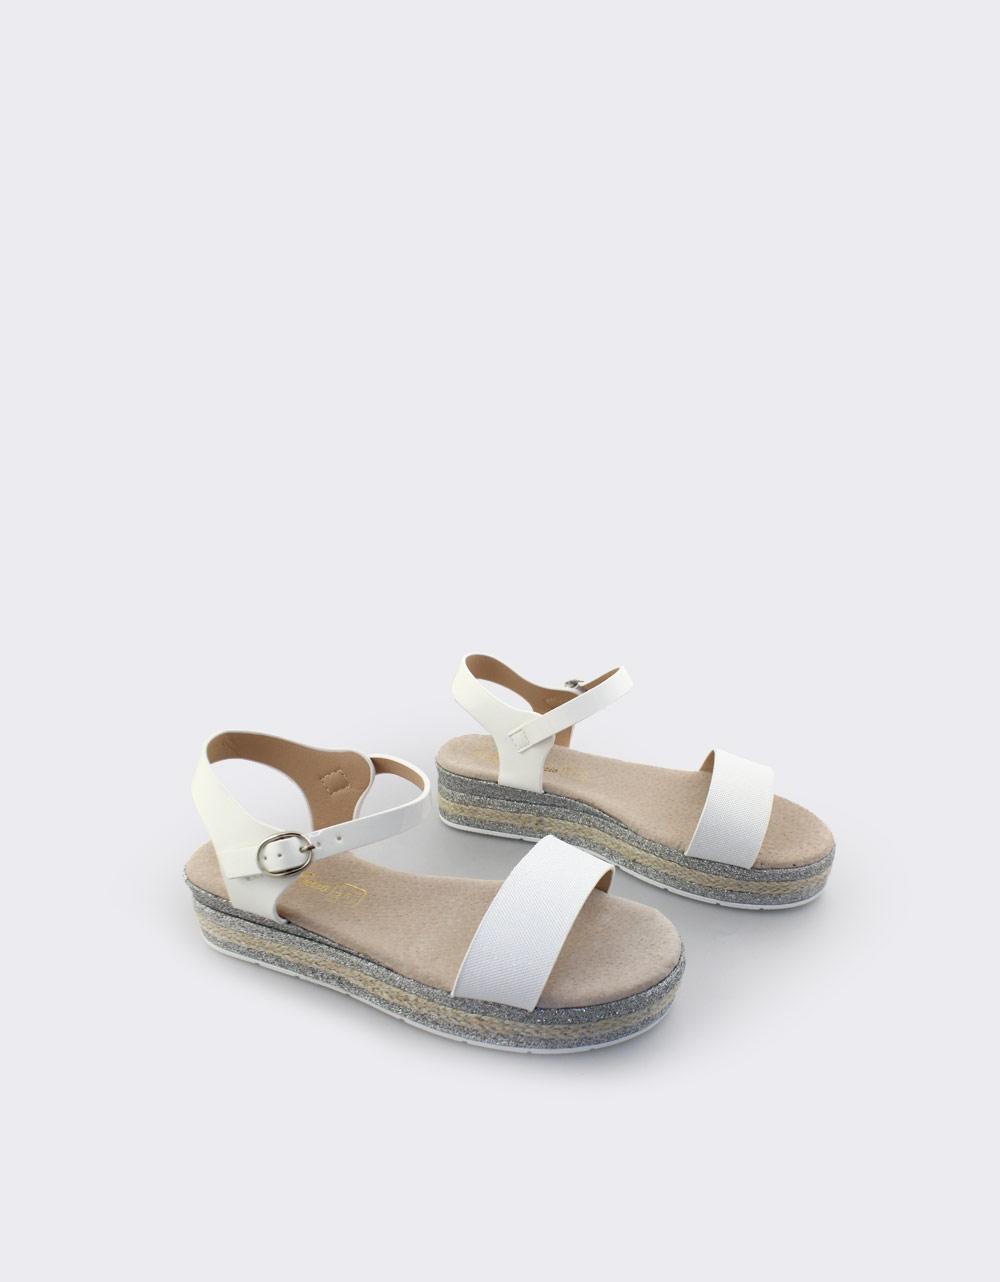 5085463878e Inshoes.gr. Παιδικά πέδιλα με μεταλλιζέ λεπτομέρειες | InShoes.gr Λευκό